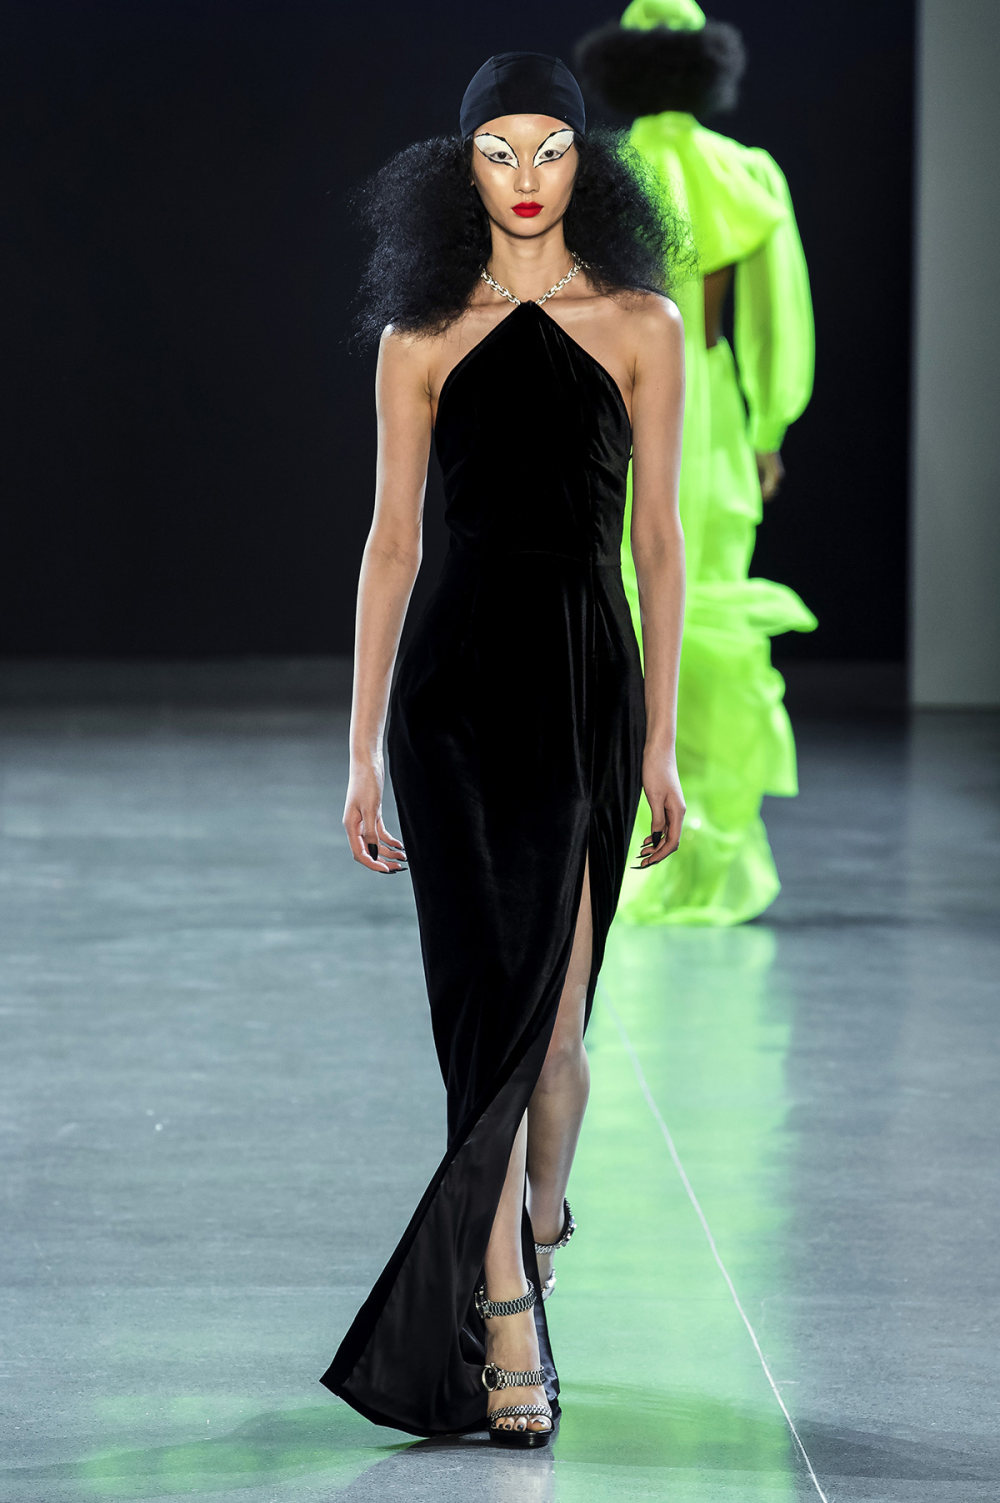 Christian Cowan时装系列虽然巨大的薄纱层状服装并没有那么特别-32.jpg